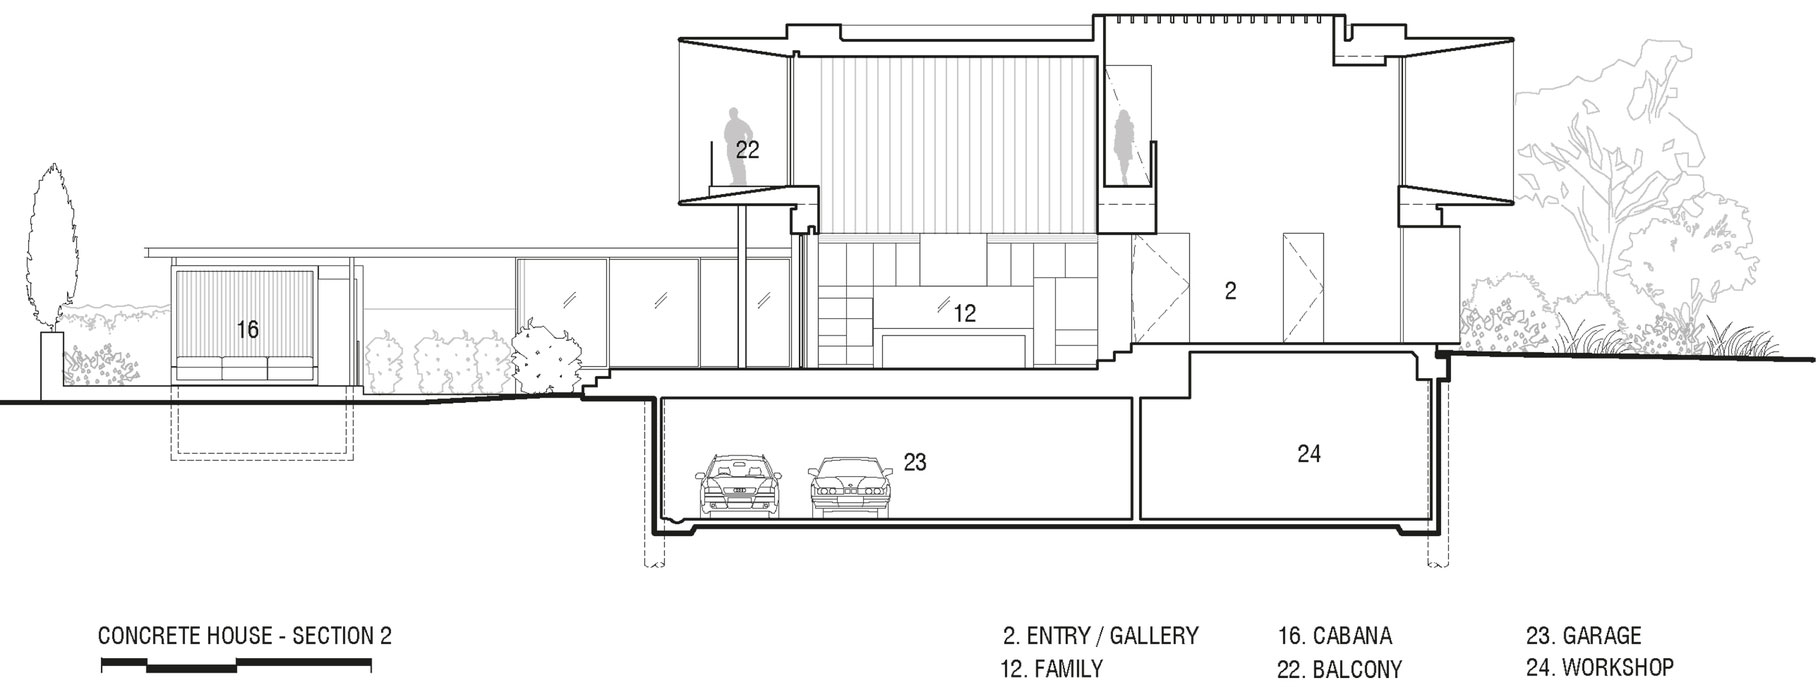 Concrete-House-24